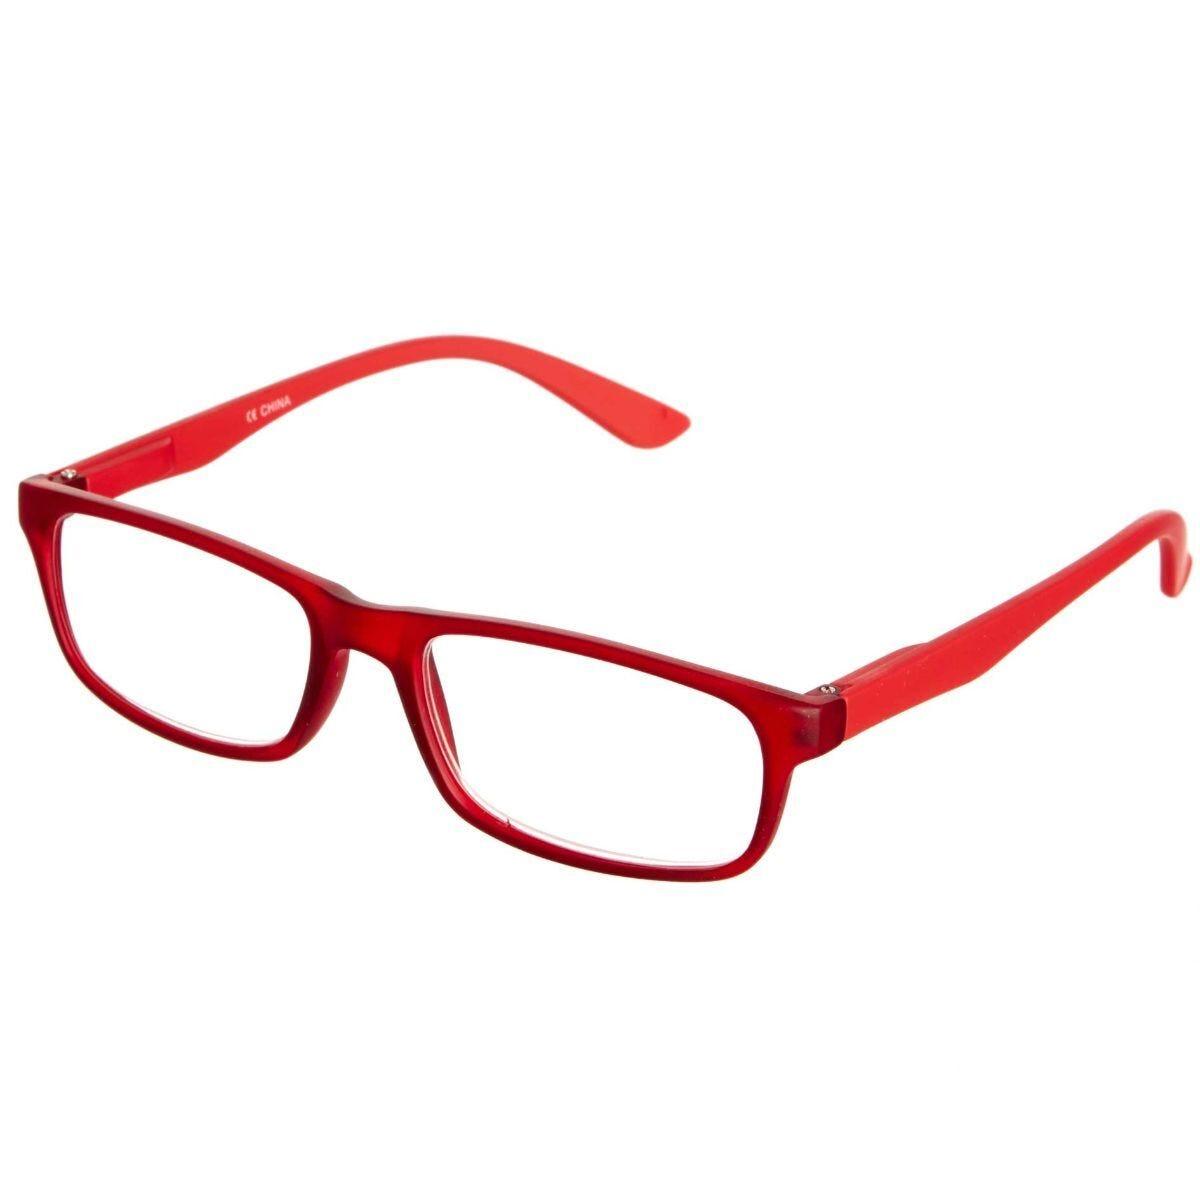 Ryman Reading Glasses + 1.0 Red Plastic Frame